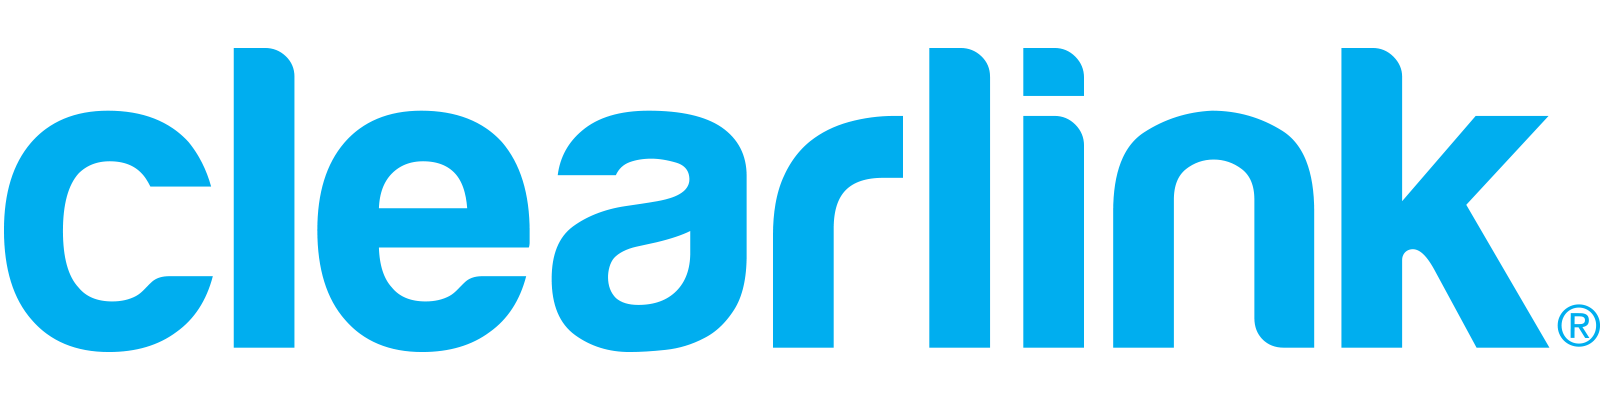 HighSpeedInternet—2017 Outreach- Logo